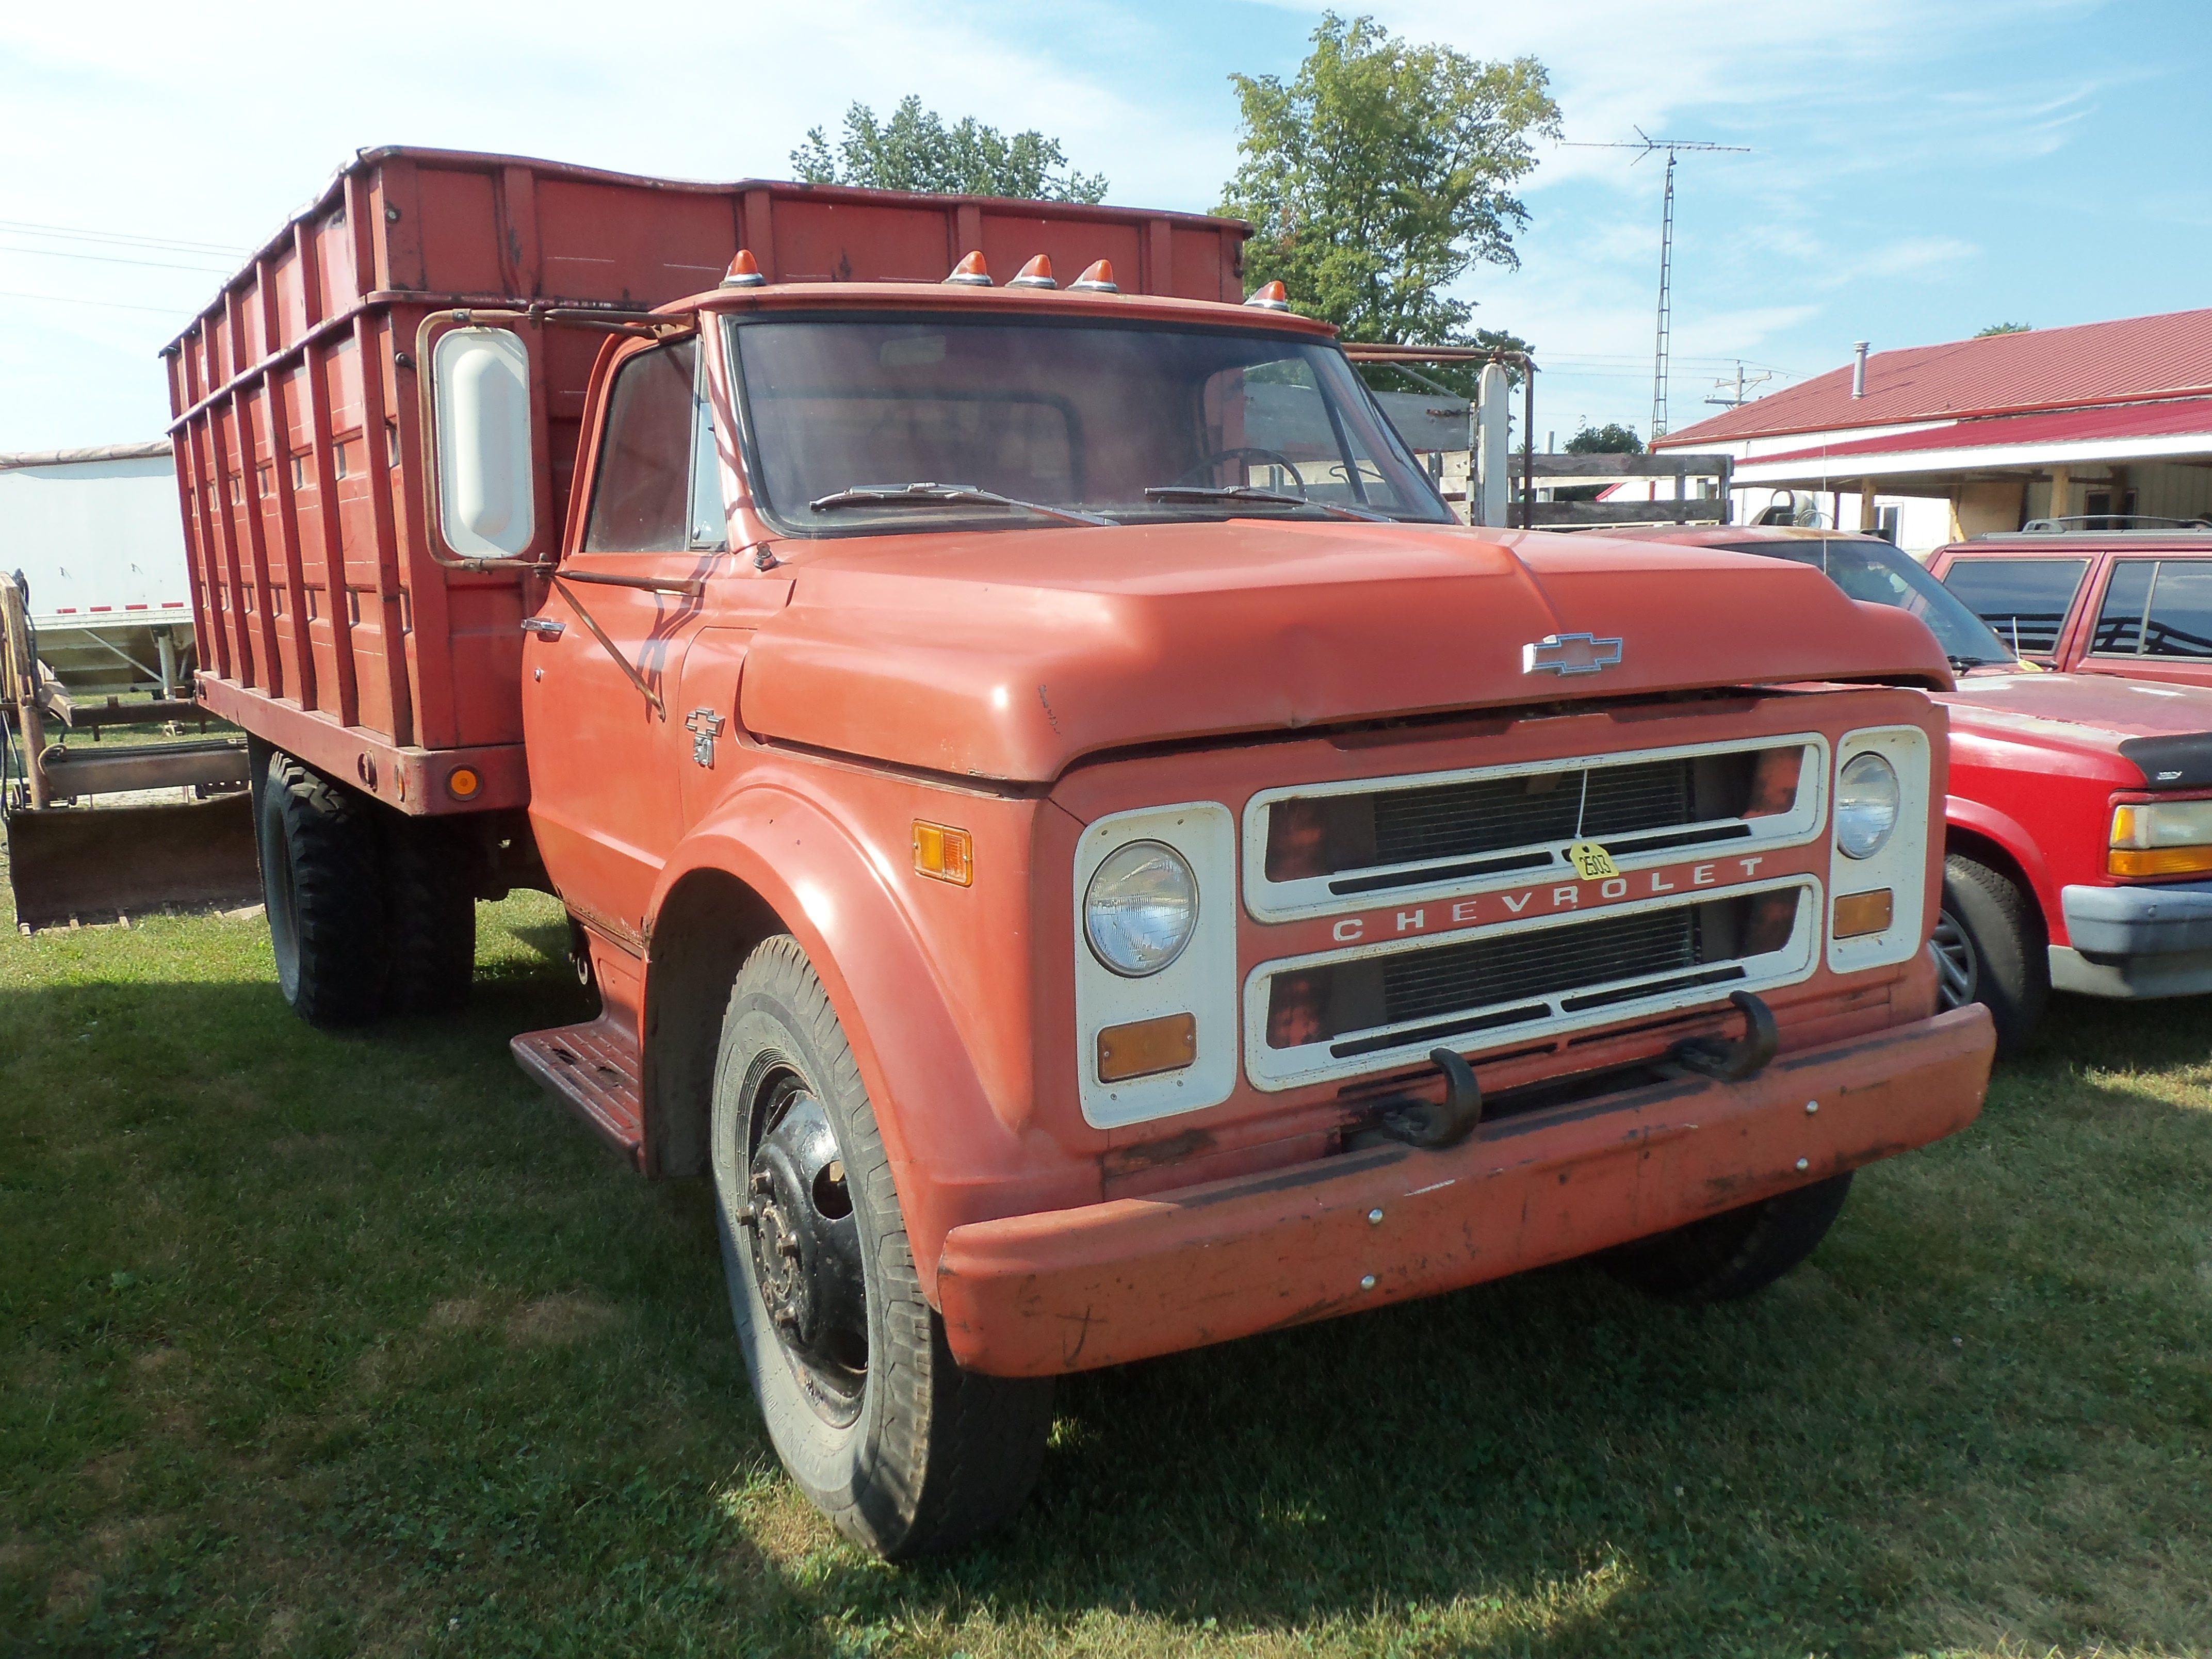 1968 Red Chevrolet 50 Grain Truck Country Trucks Chevy Trucks Chevrolet Trucks